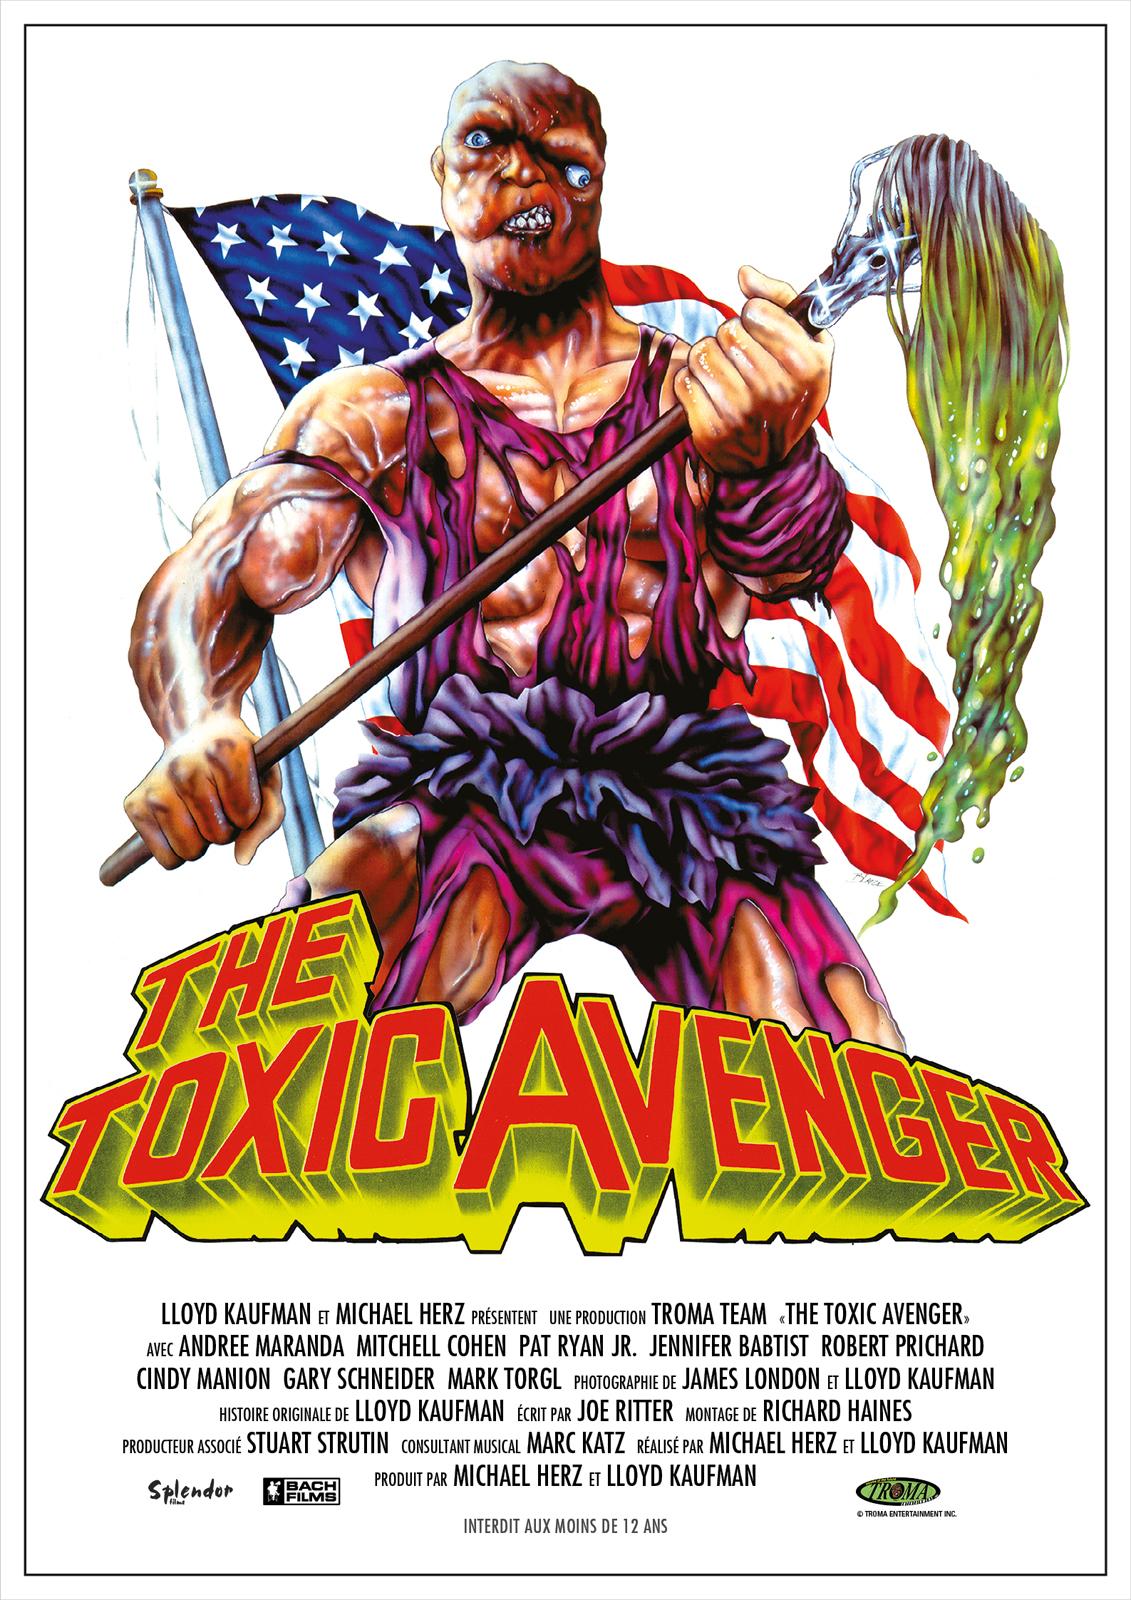 Image du film Toxic Avenger